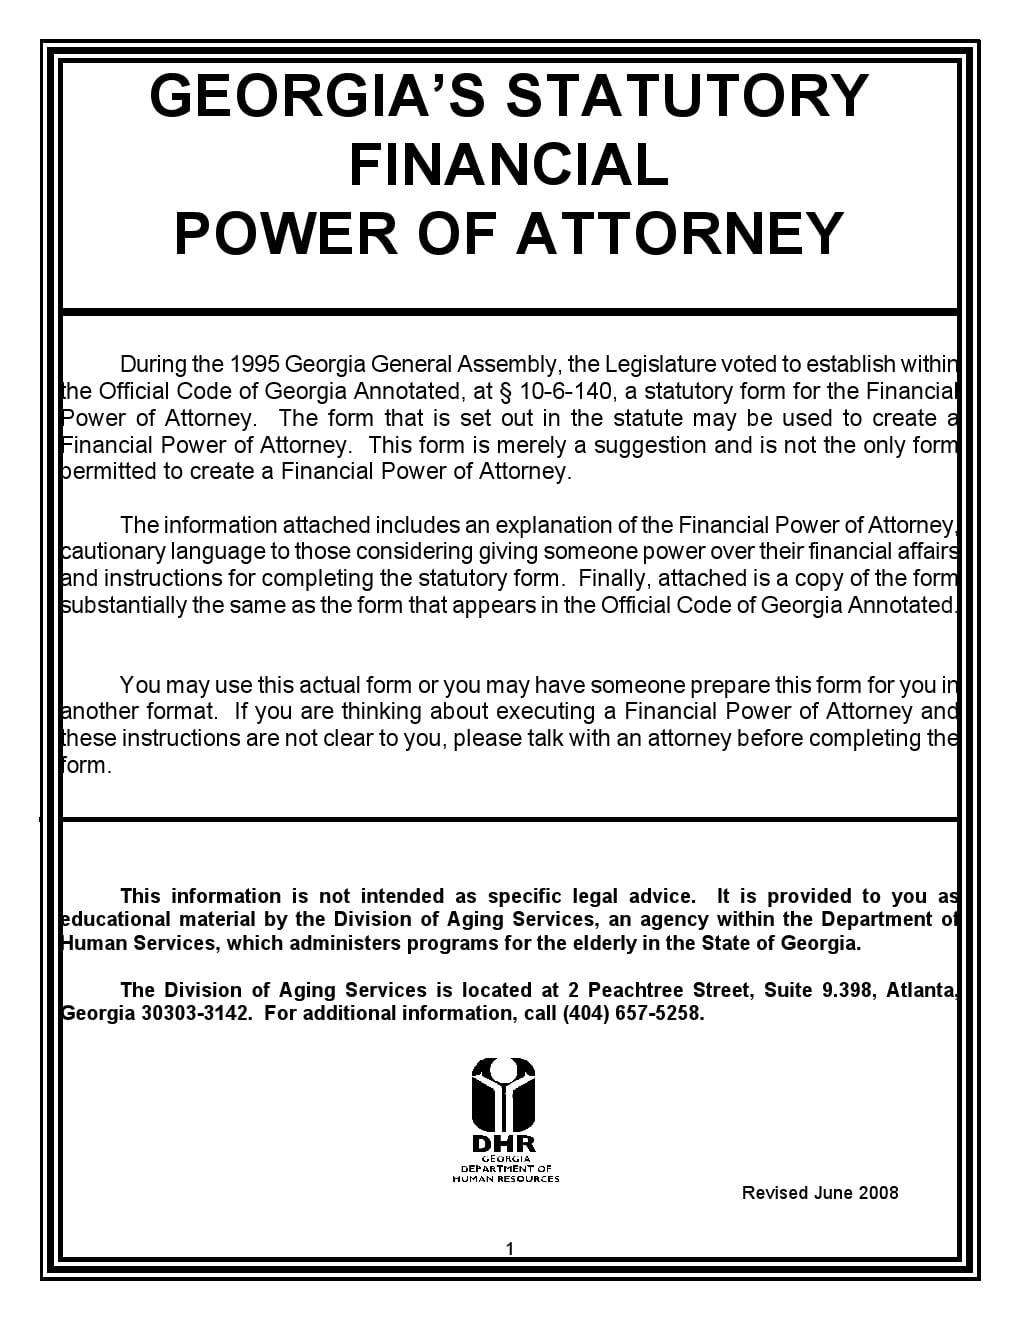 Statutory Fiancial Power of Attorney Georgia